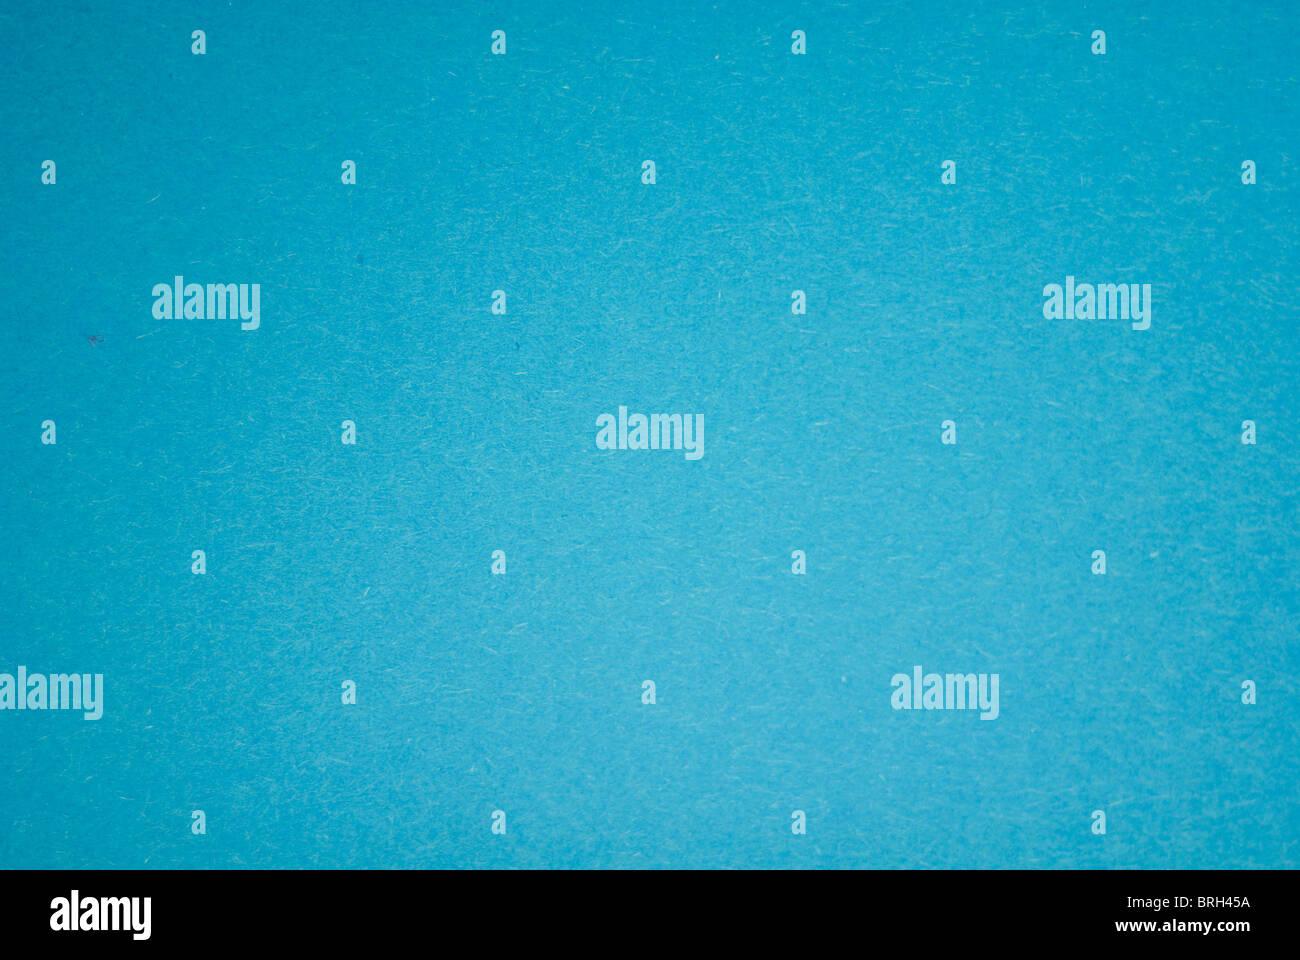 Textured Blue background shot close-up on lightbox - Stock Image